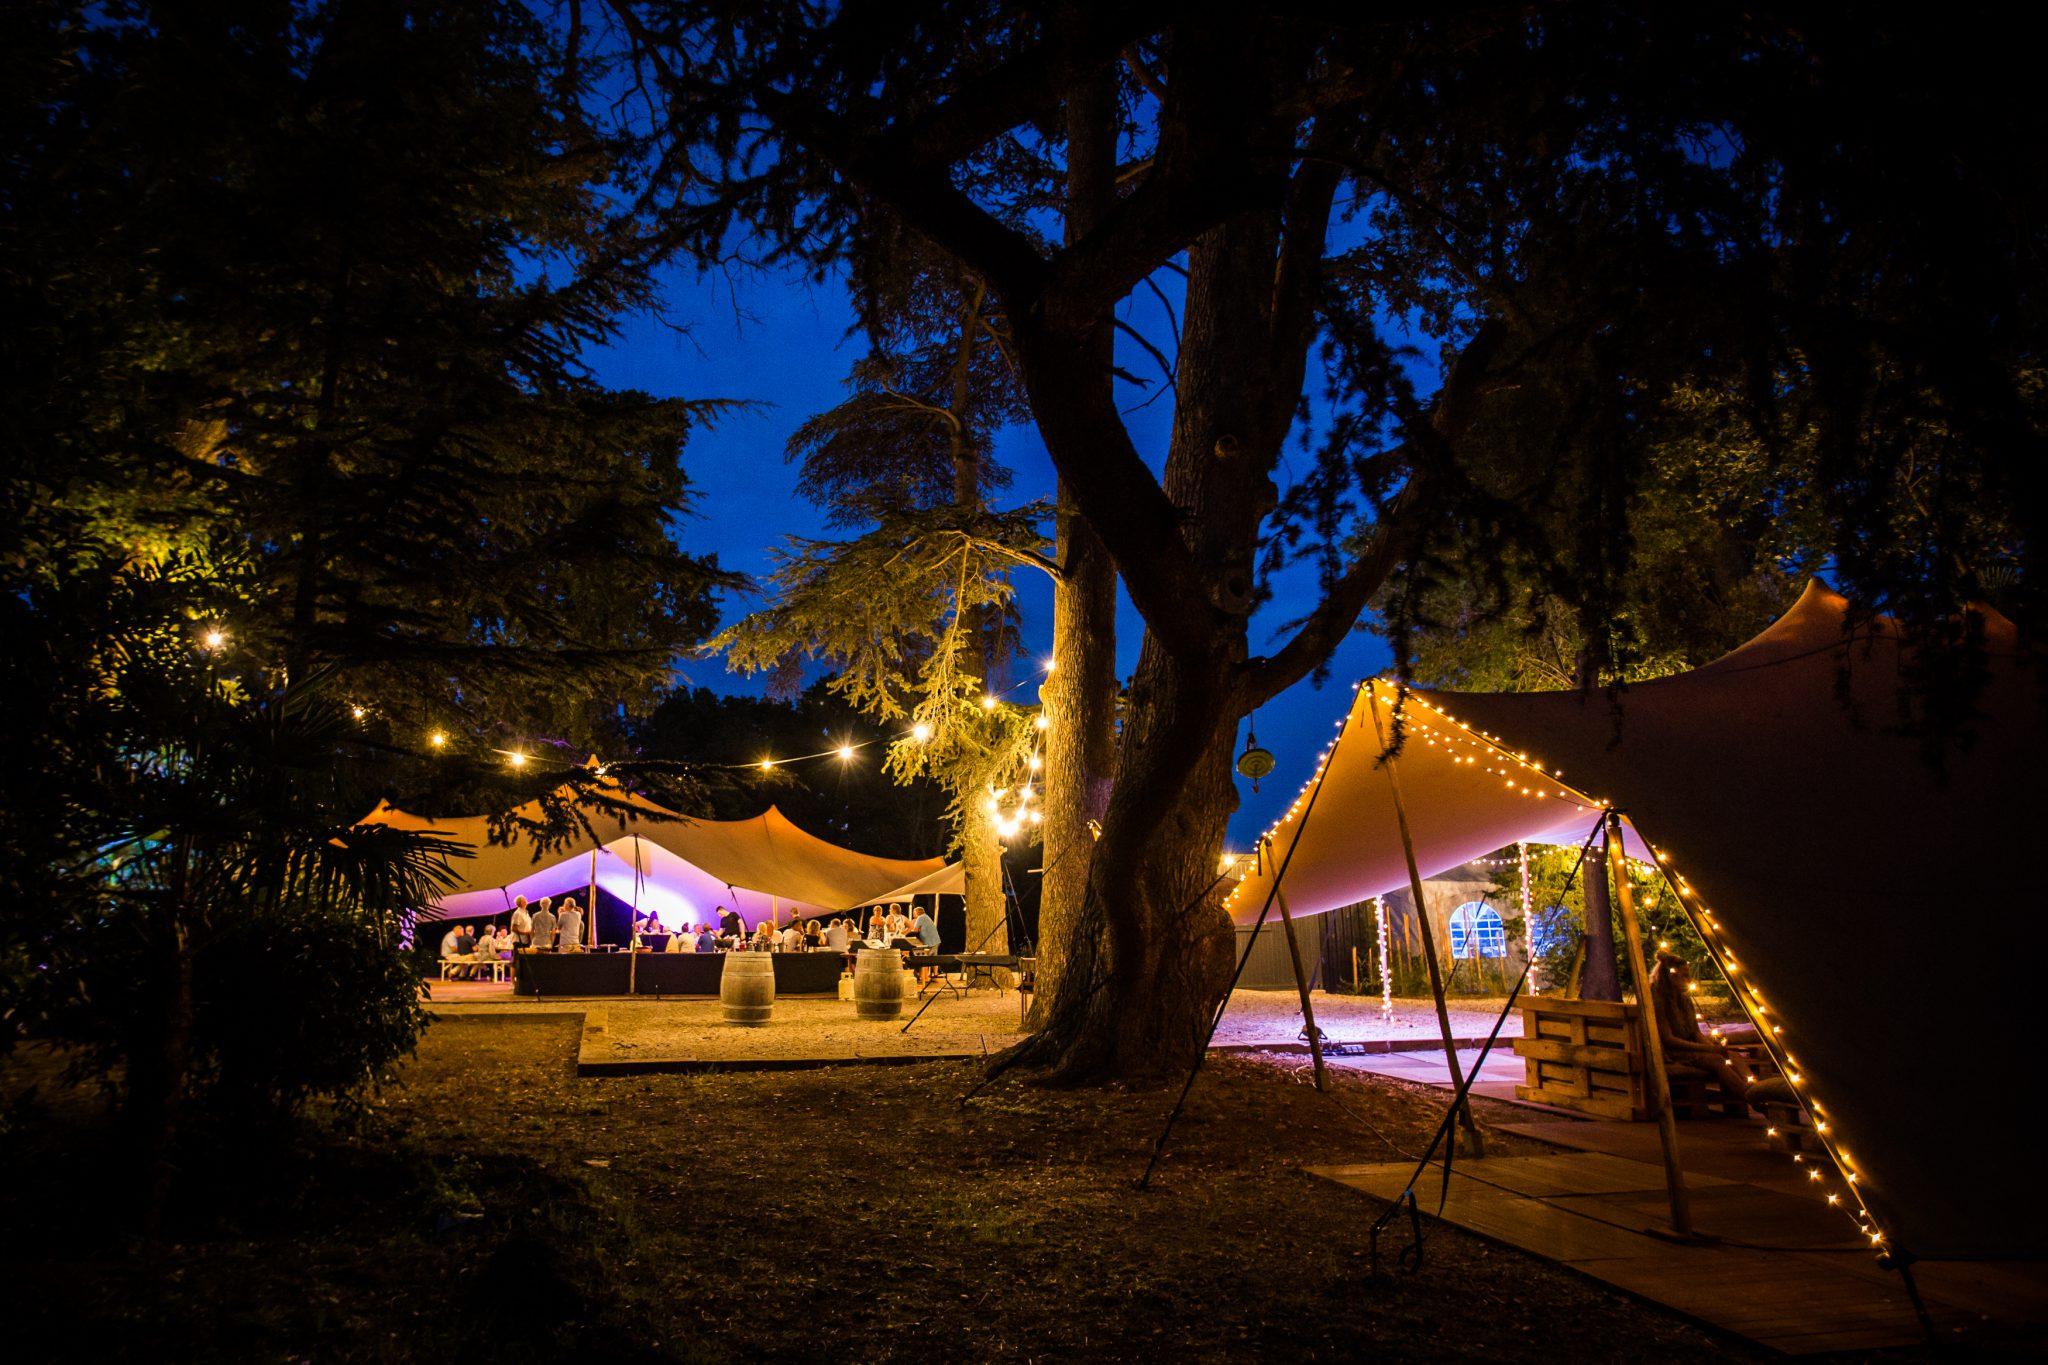 Feest trouwlocatie Chateau de Blomac Frankrijk